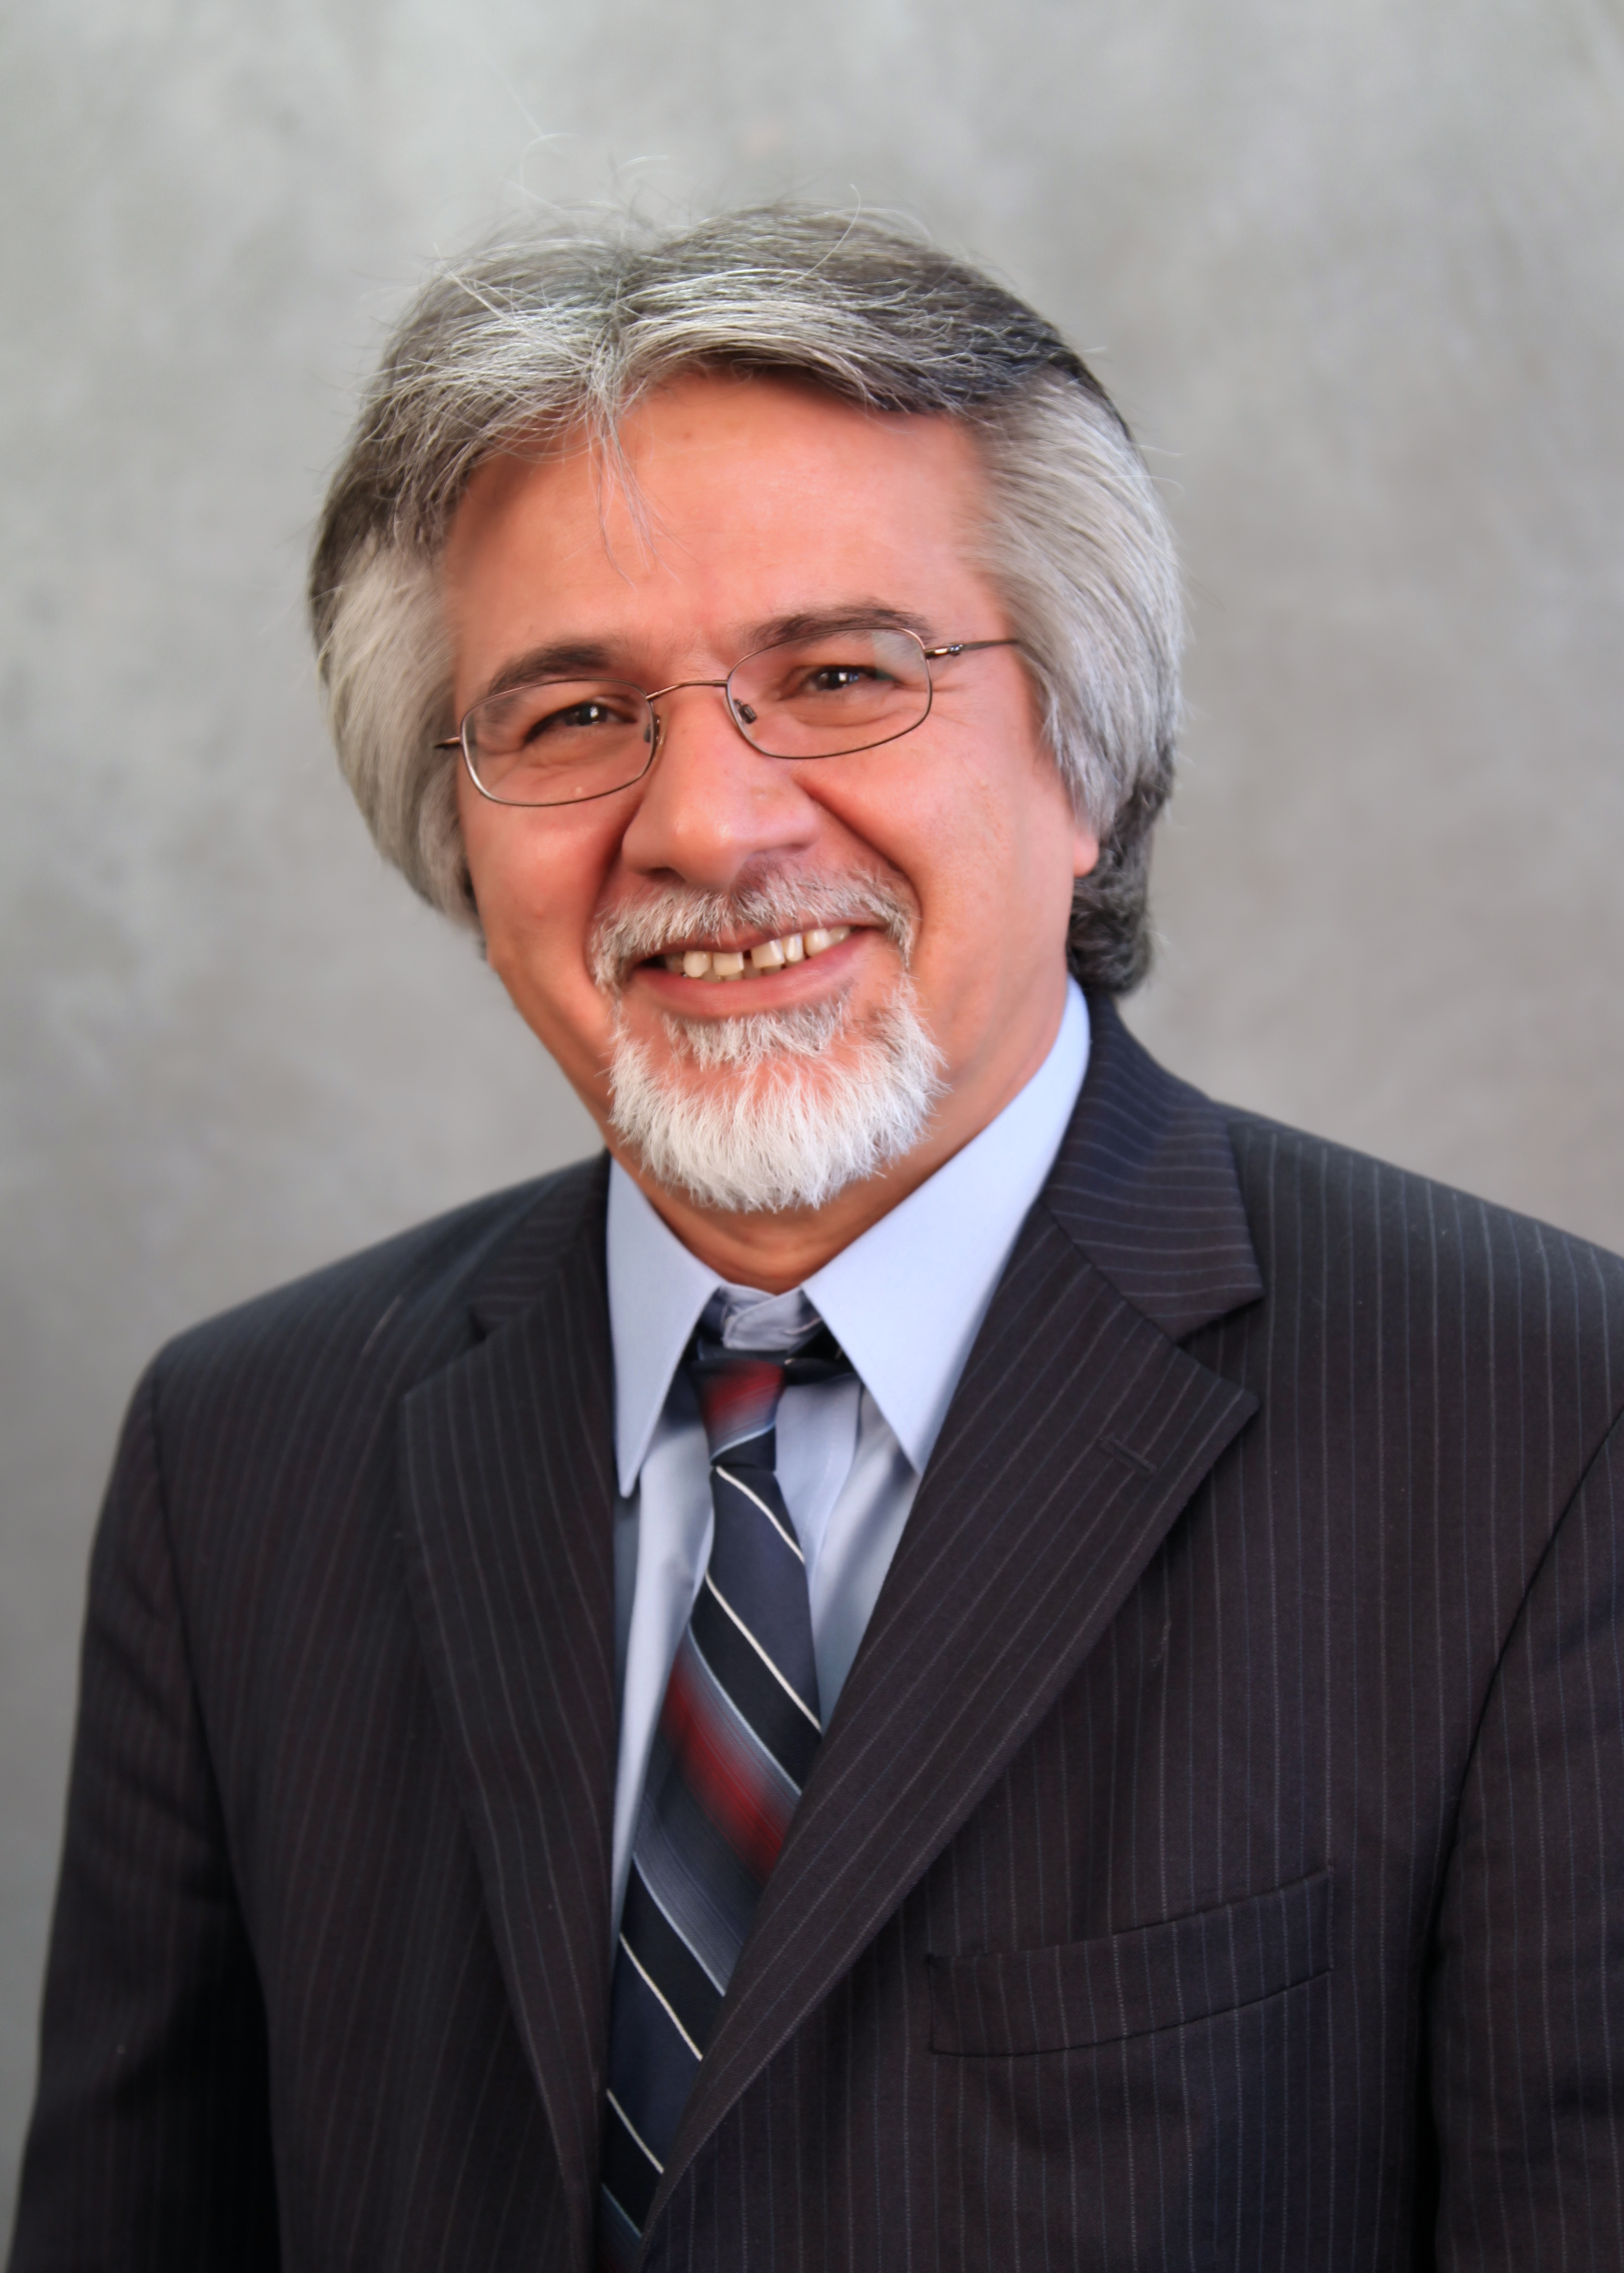 Hossein Toghiani